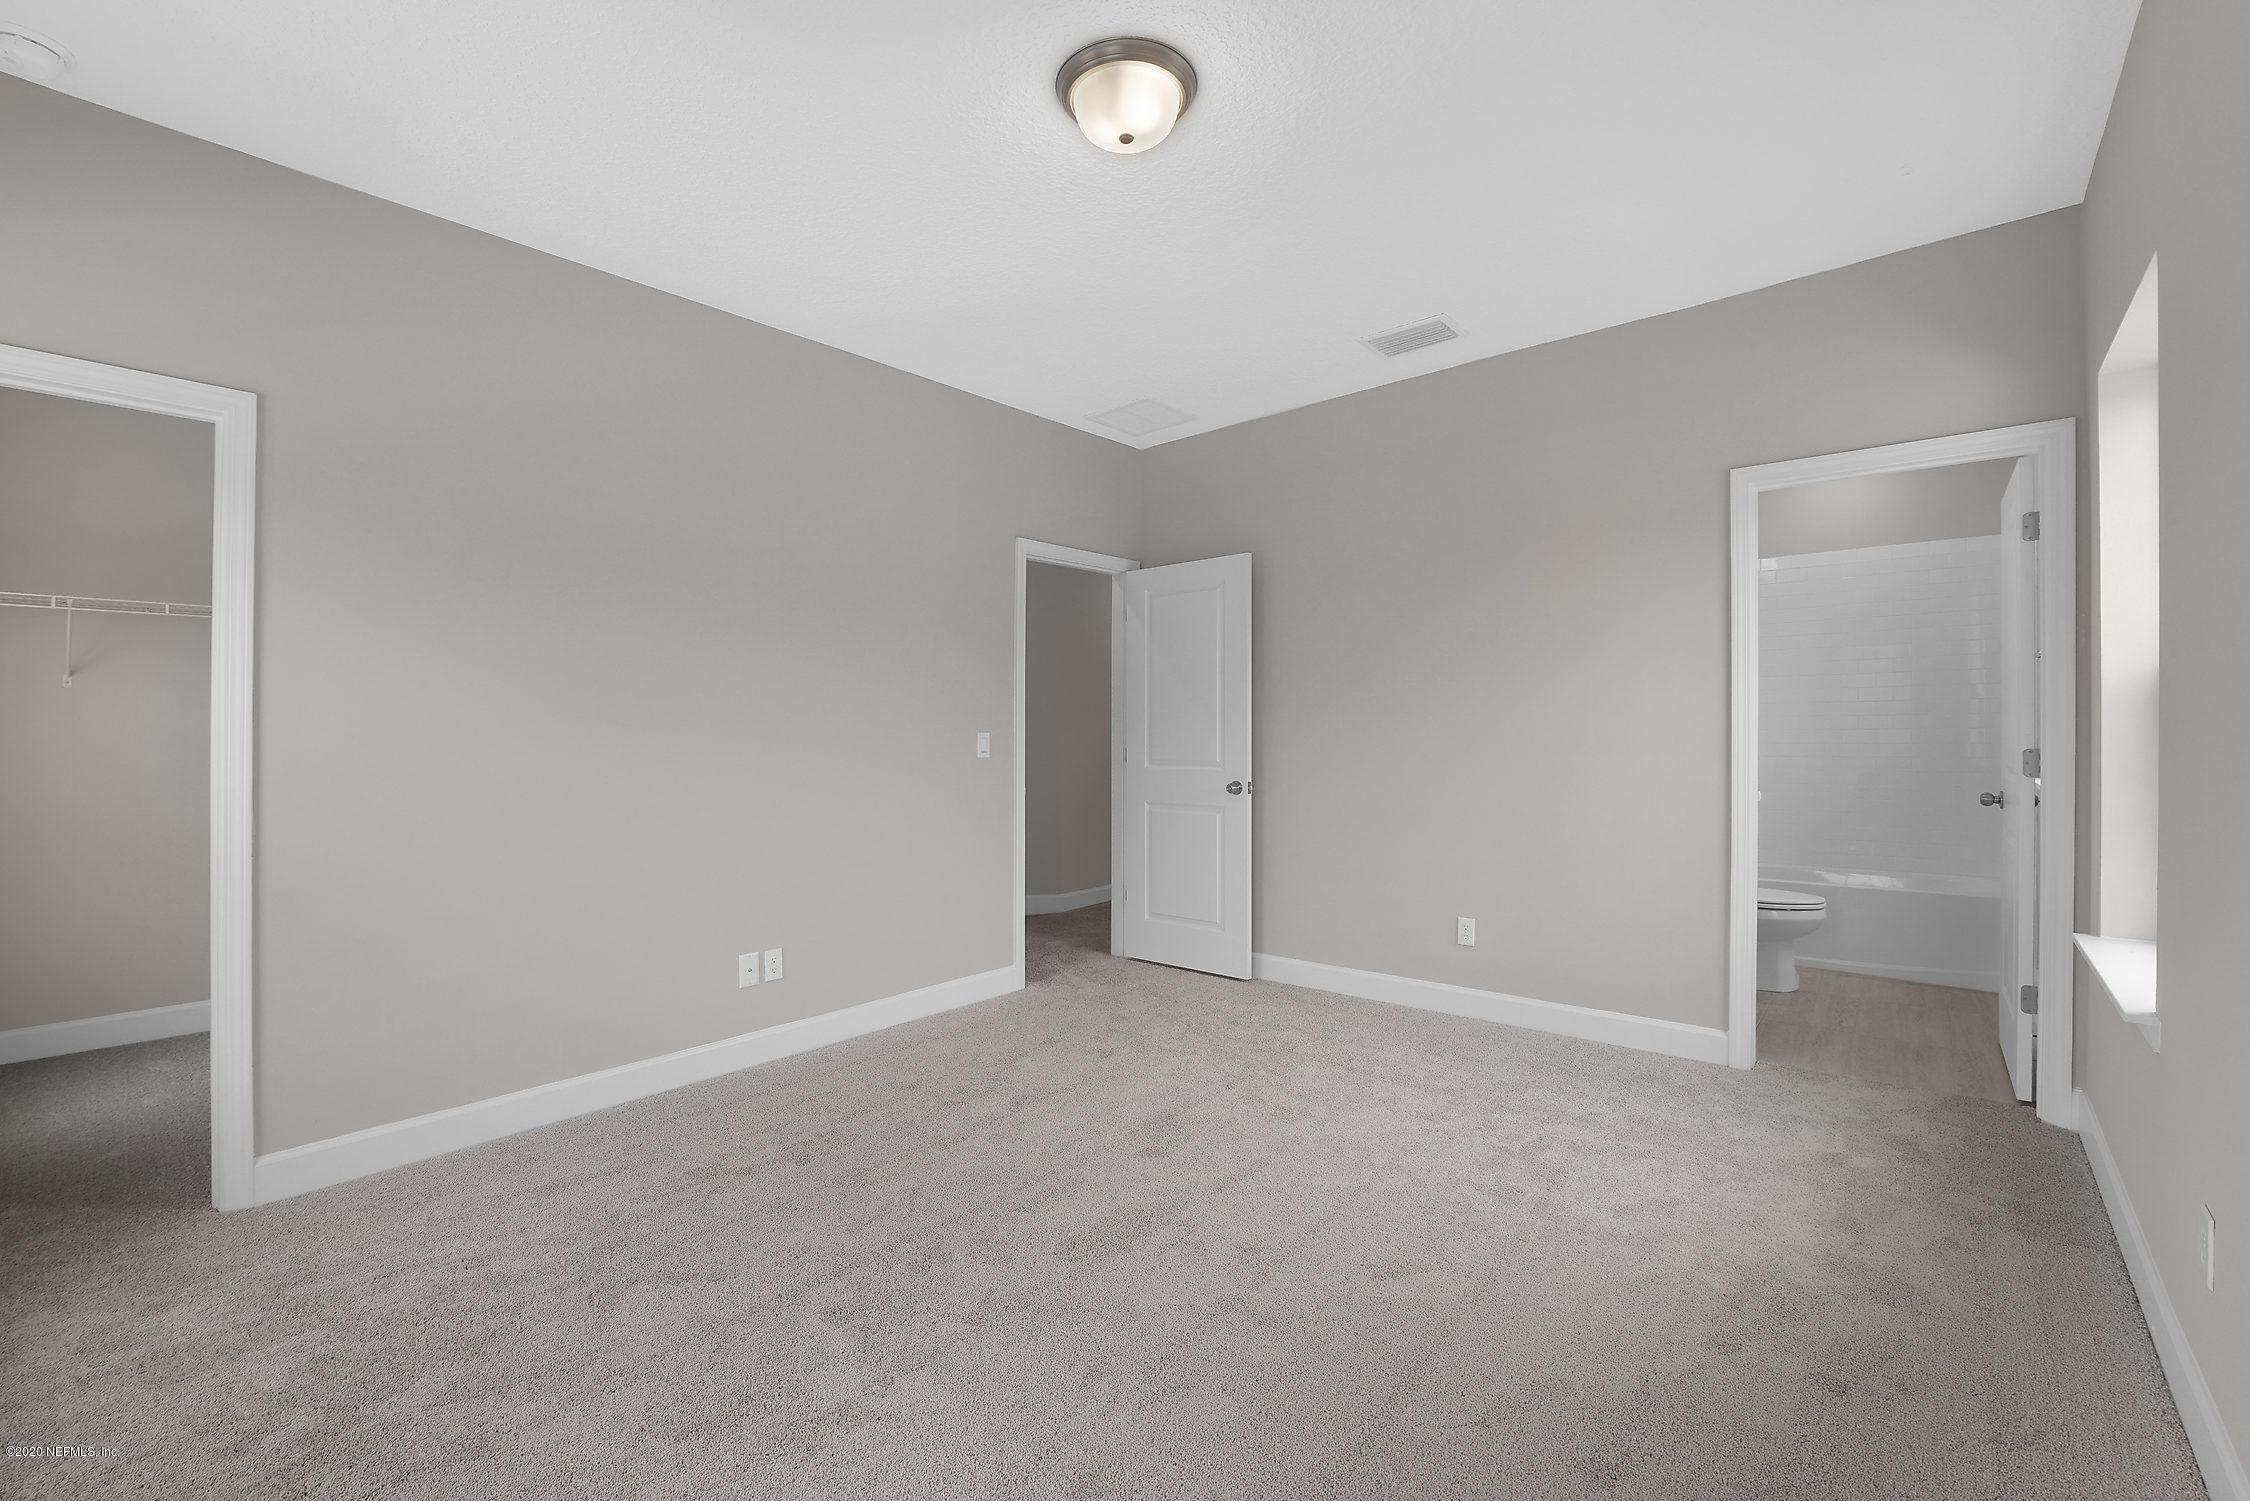 48 FREEDOM LANDING, PONTE VEDRA, FLORIDA 32081, 4 Bedrooms Bedrooms, ,3 BathroomsBathrooms,Residential,For sale,FREEDOM LANDING,1054659